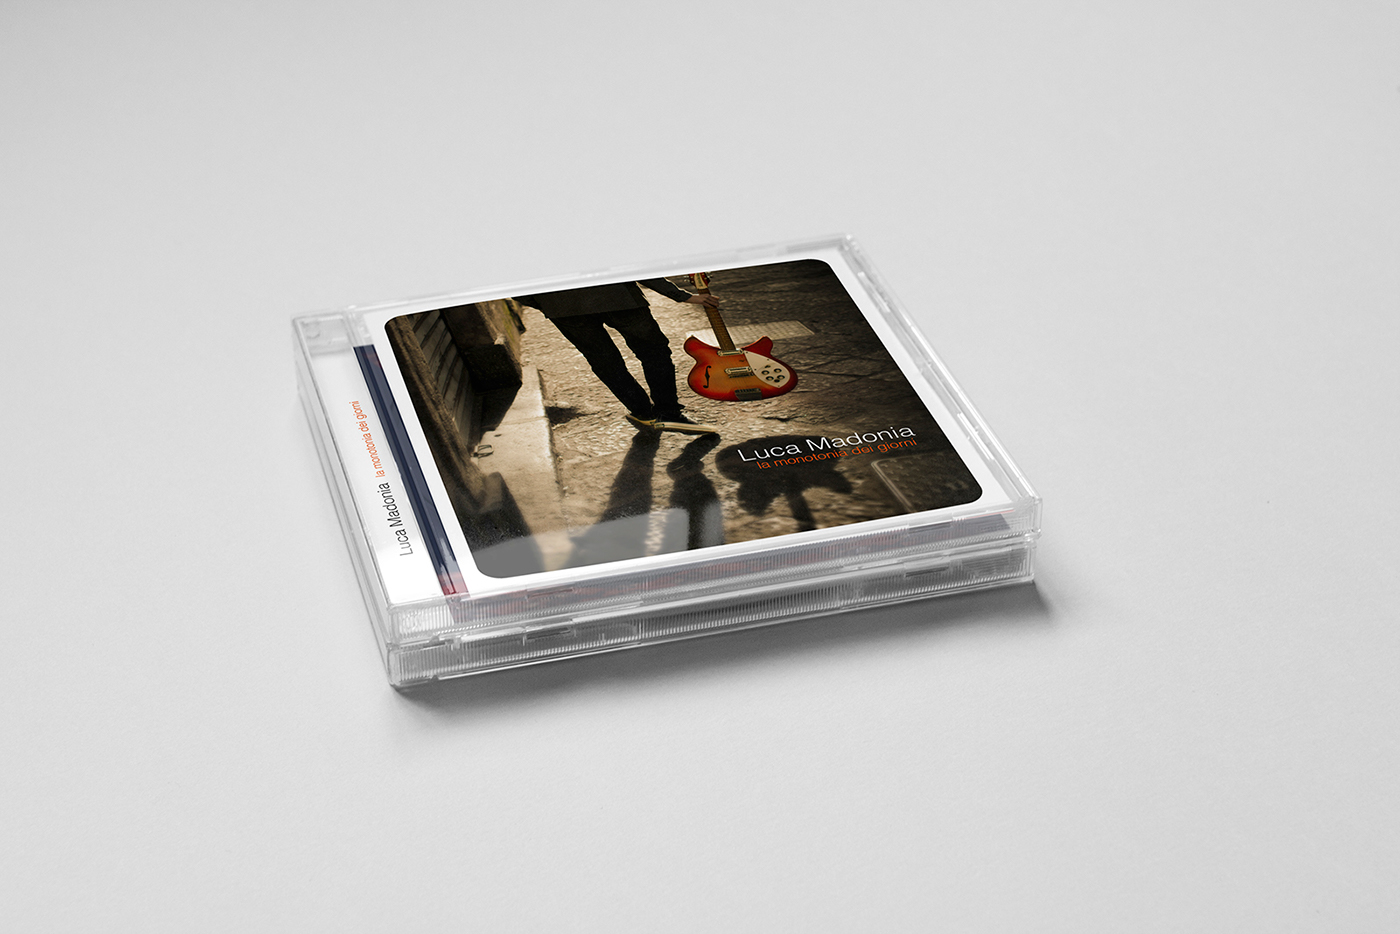 Luca Madonia Mu - agency Narciso Records universal music